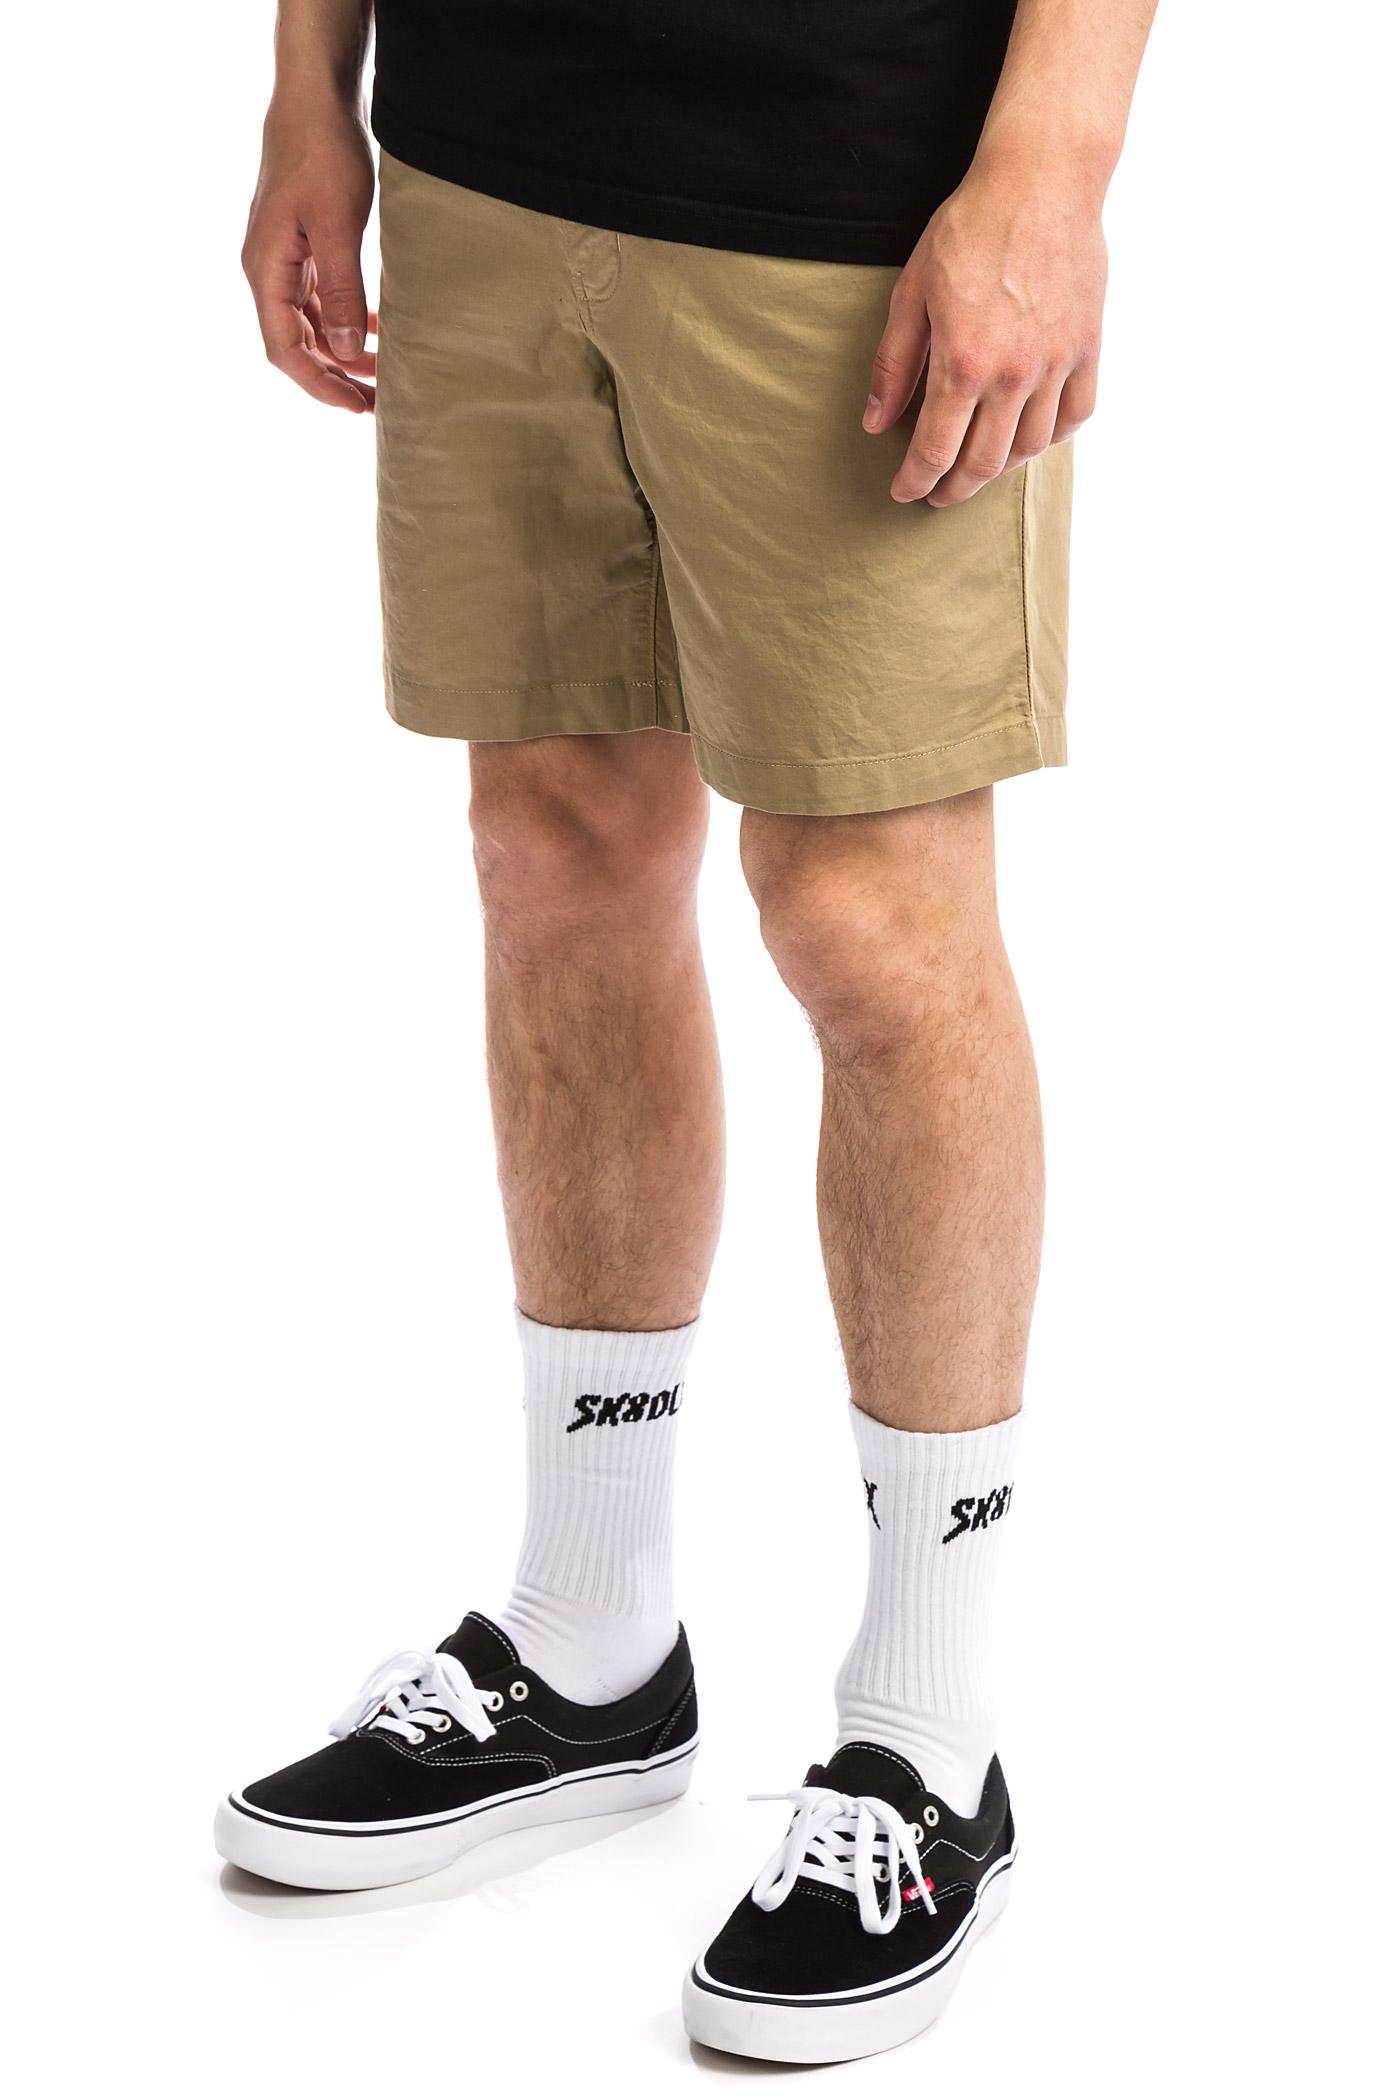 Khaki wear Hemp Patagonia Shortsmojave Lw All 6gbf7YmIyv